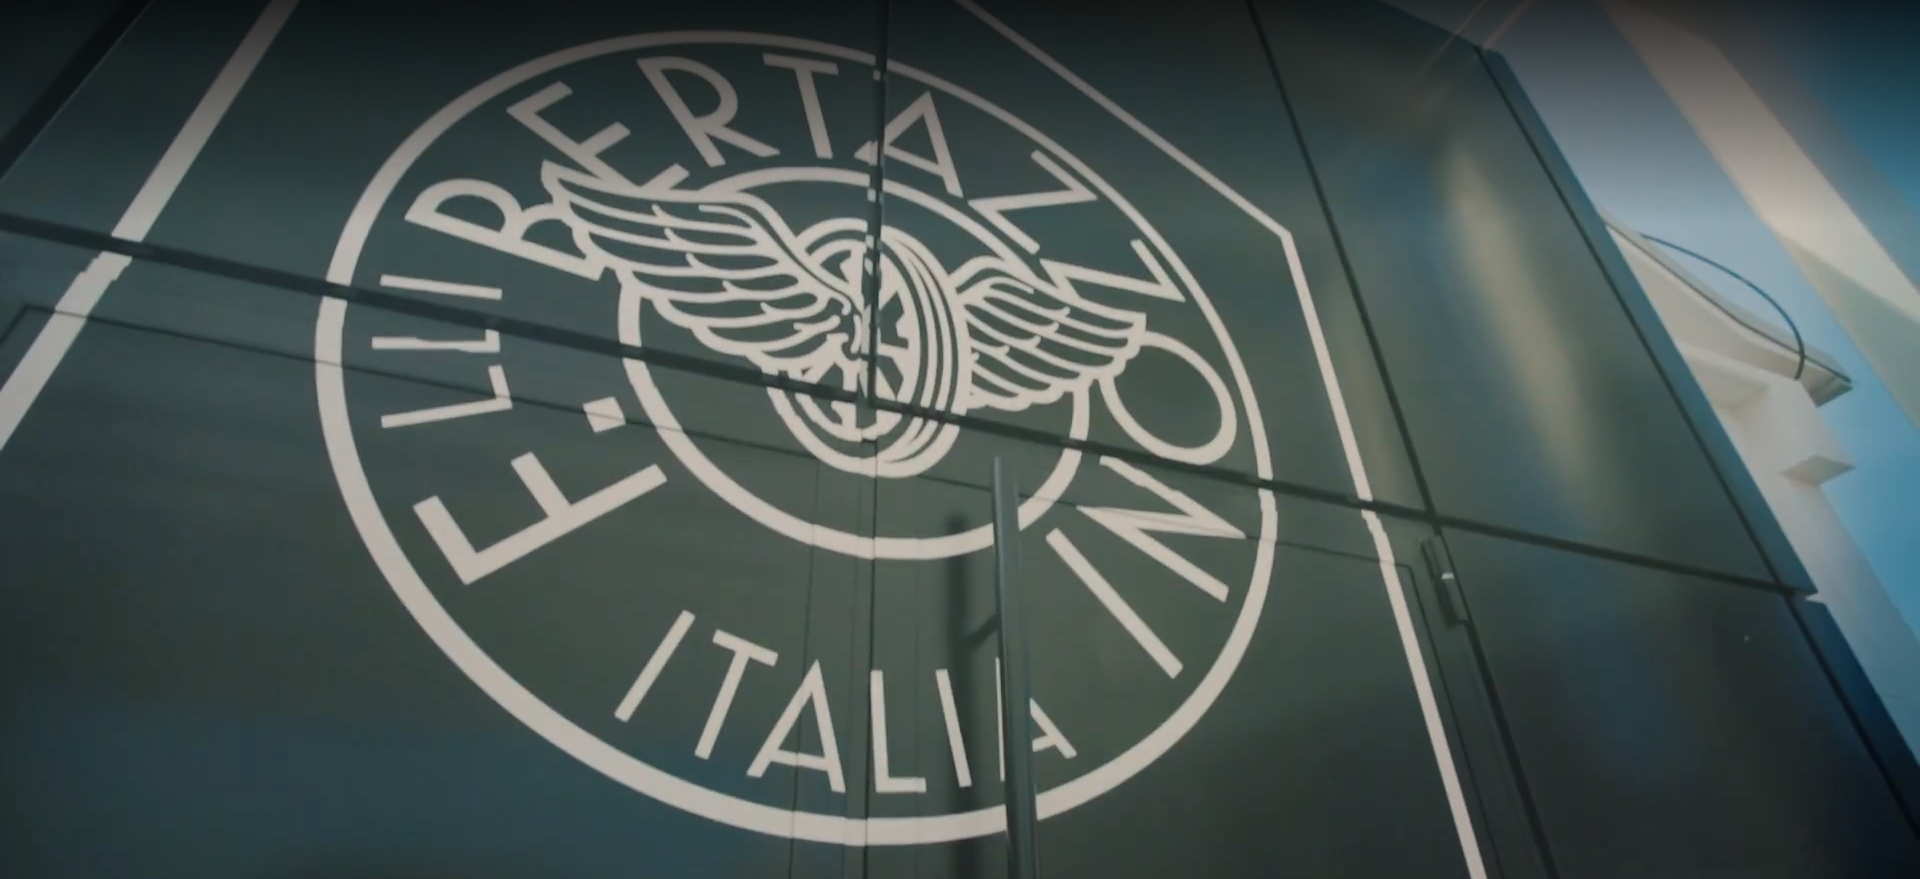 Banner Marca - Bertazzoni